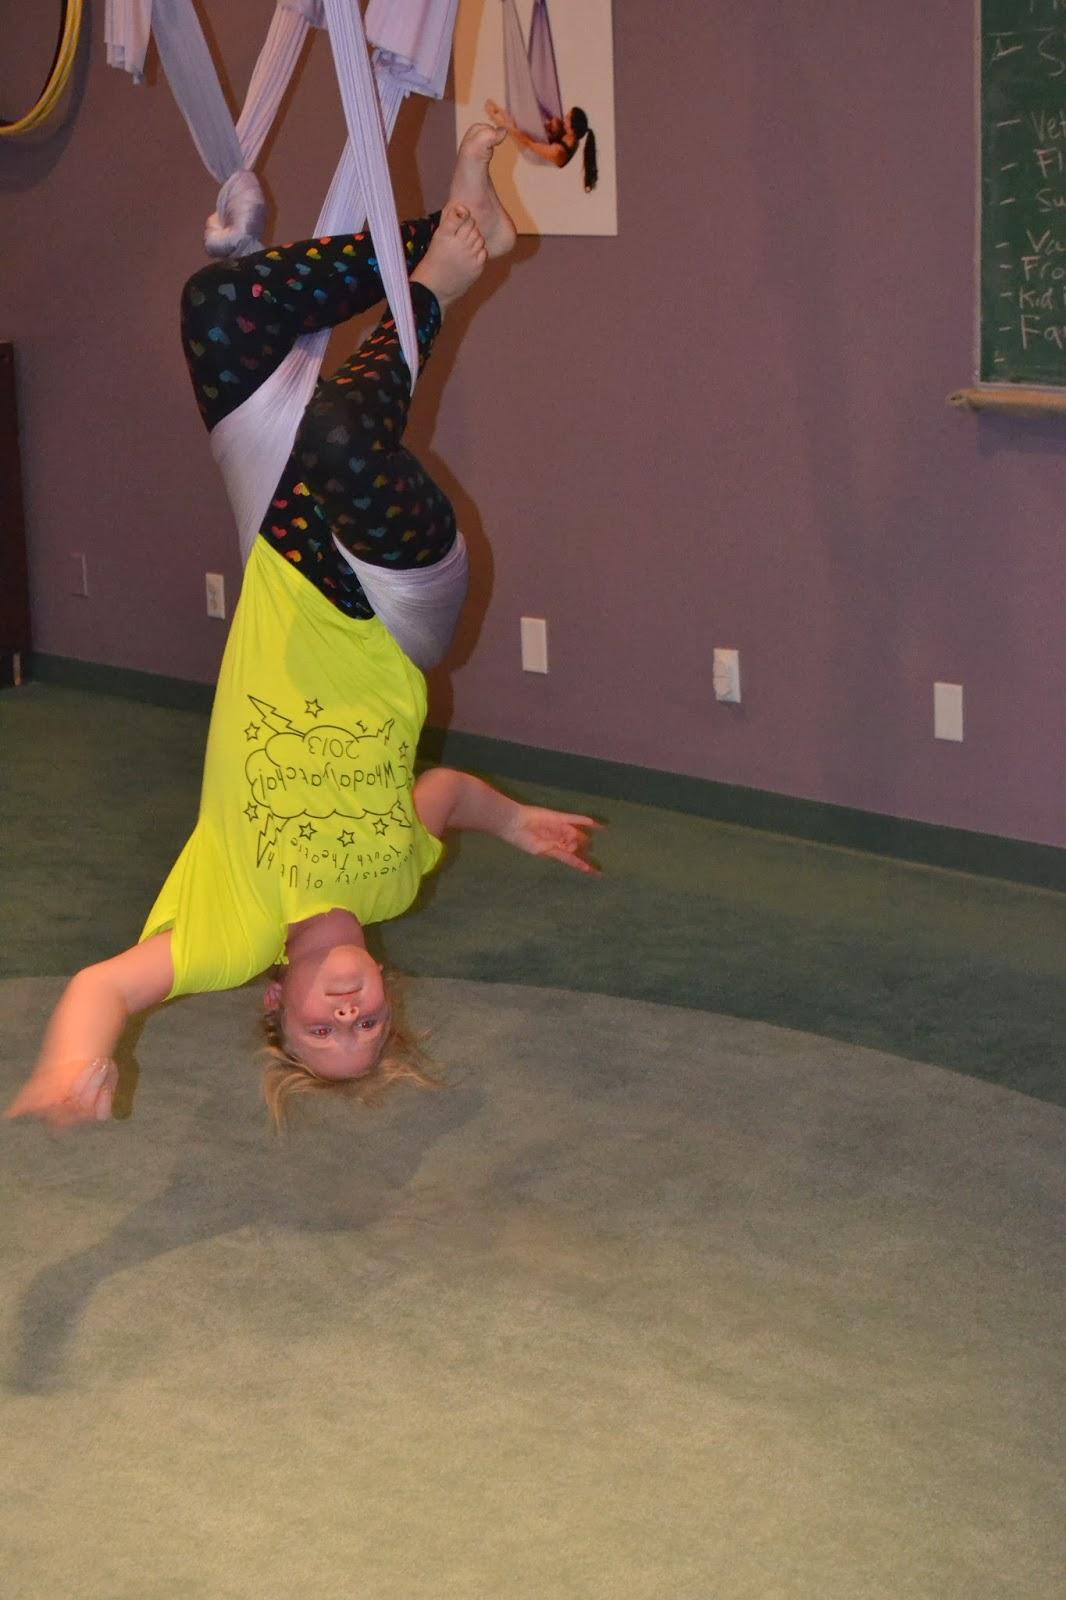 Joyful Liberation Willow S Antigravity Yoga Share